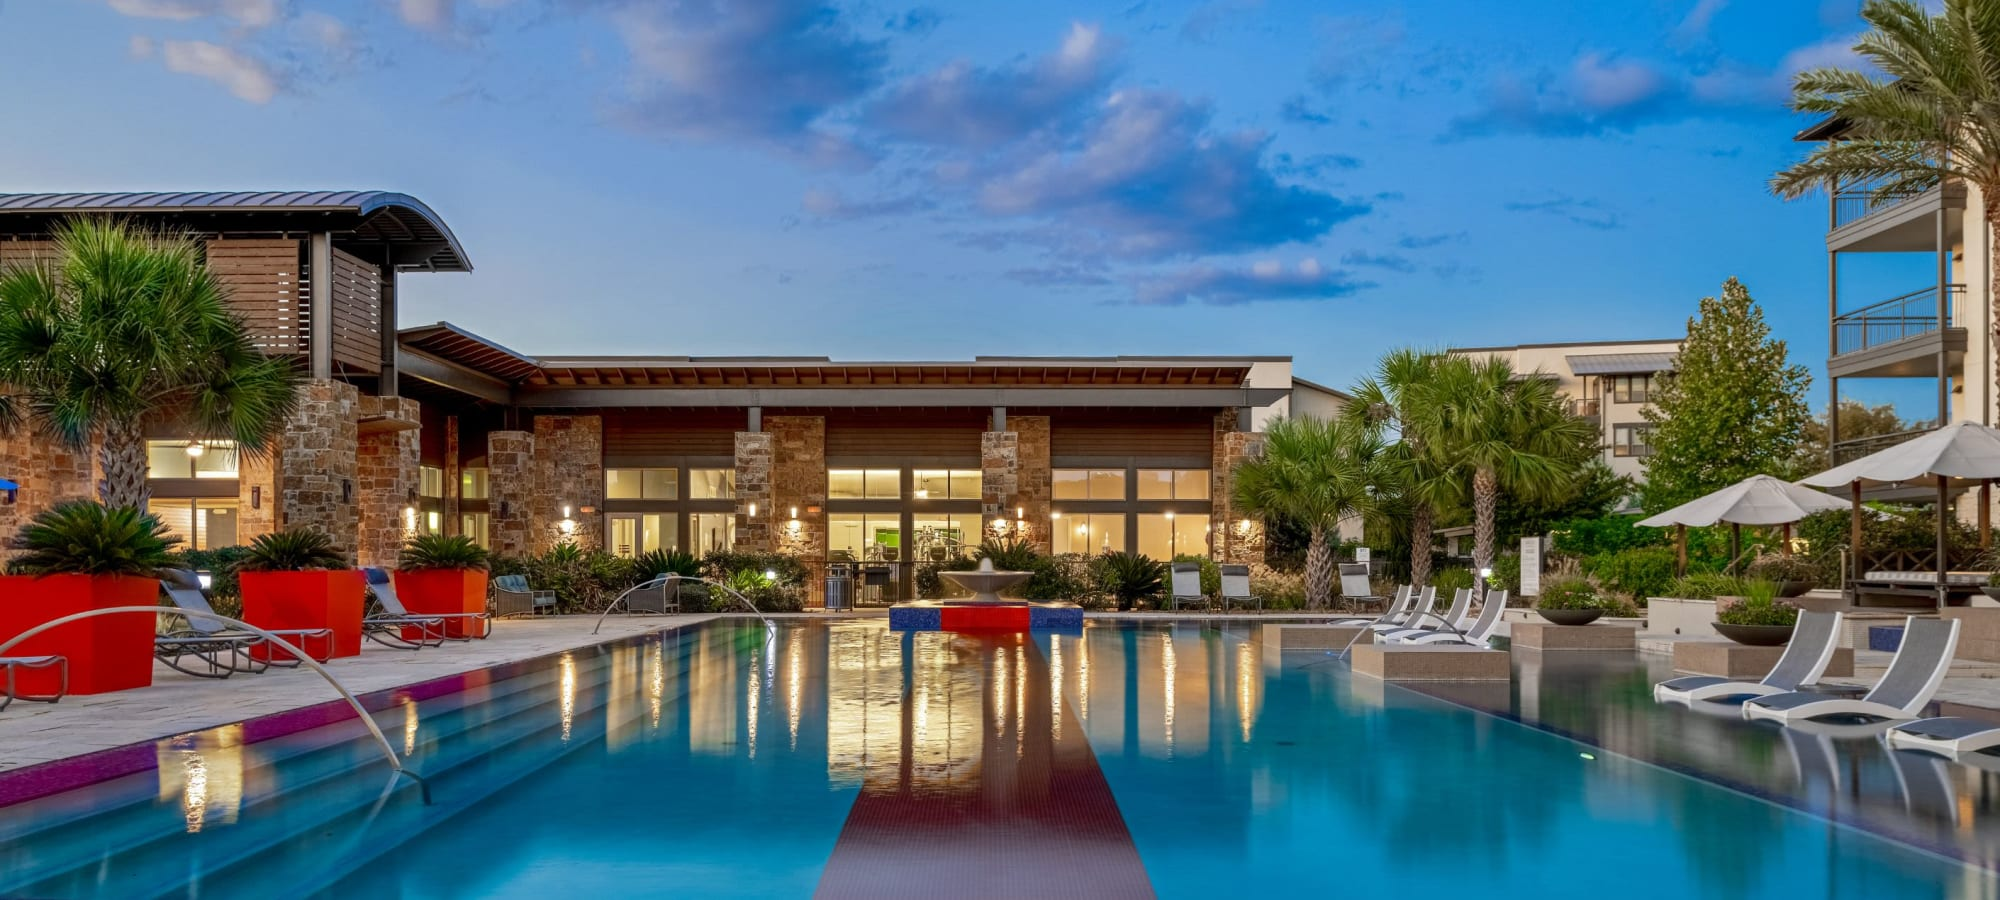 Resident information for Marquis Cresta Bella in San Antonio, Texas